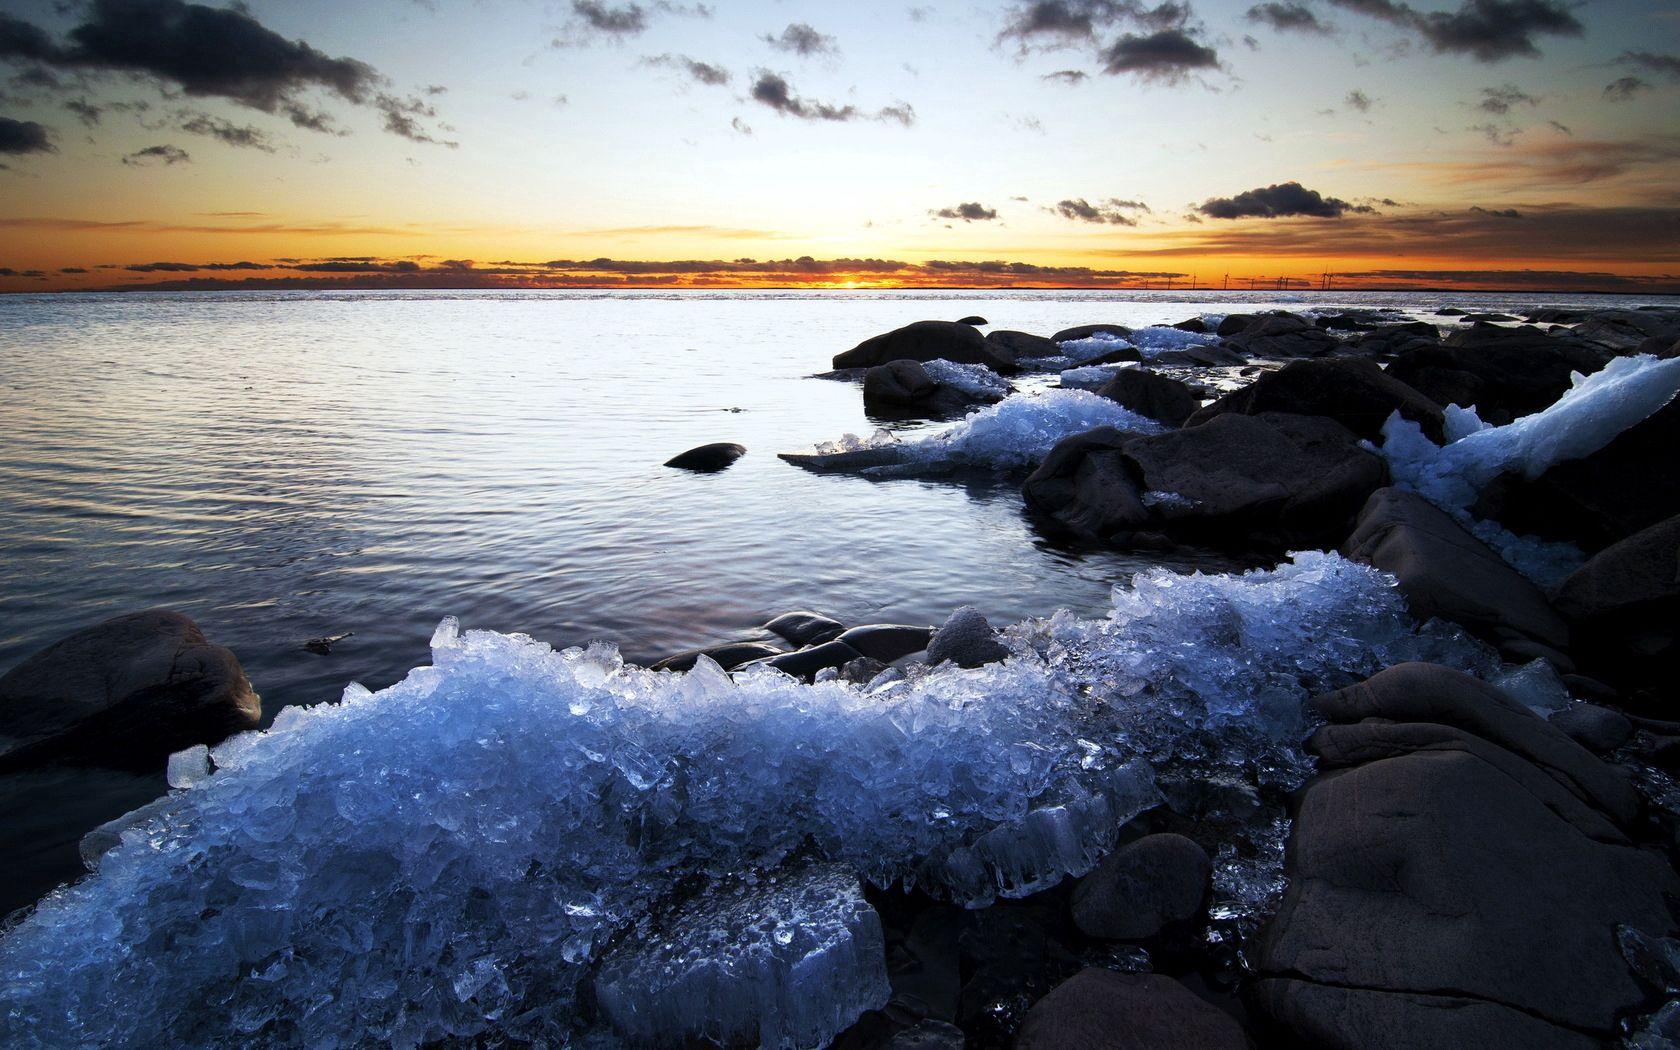 79033 скачать обои Природа, Лед, Берег, Закат, Море, Холод - заставки и картинки бесплатно